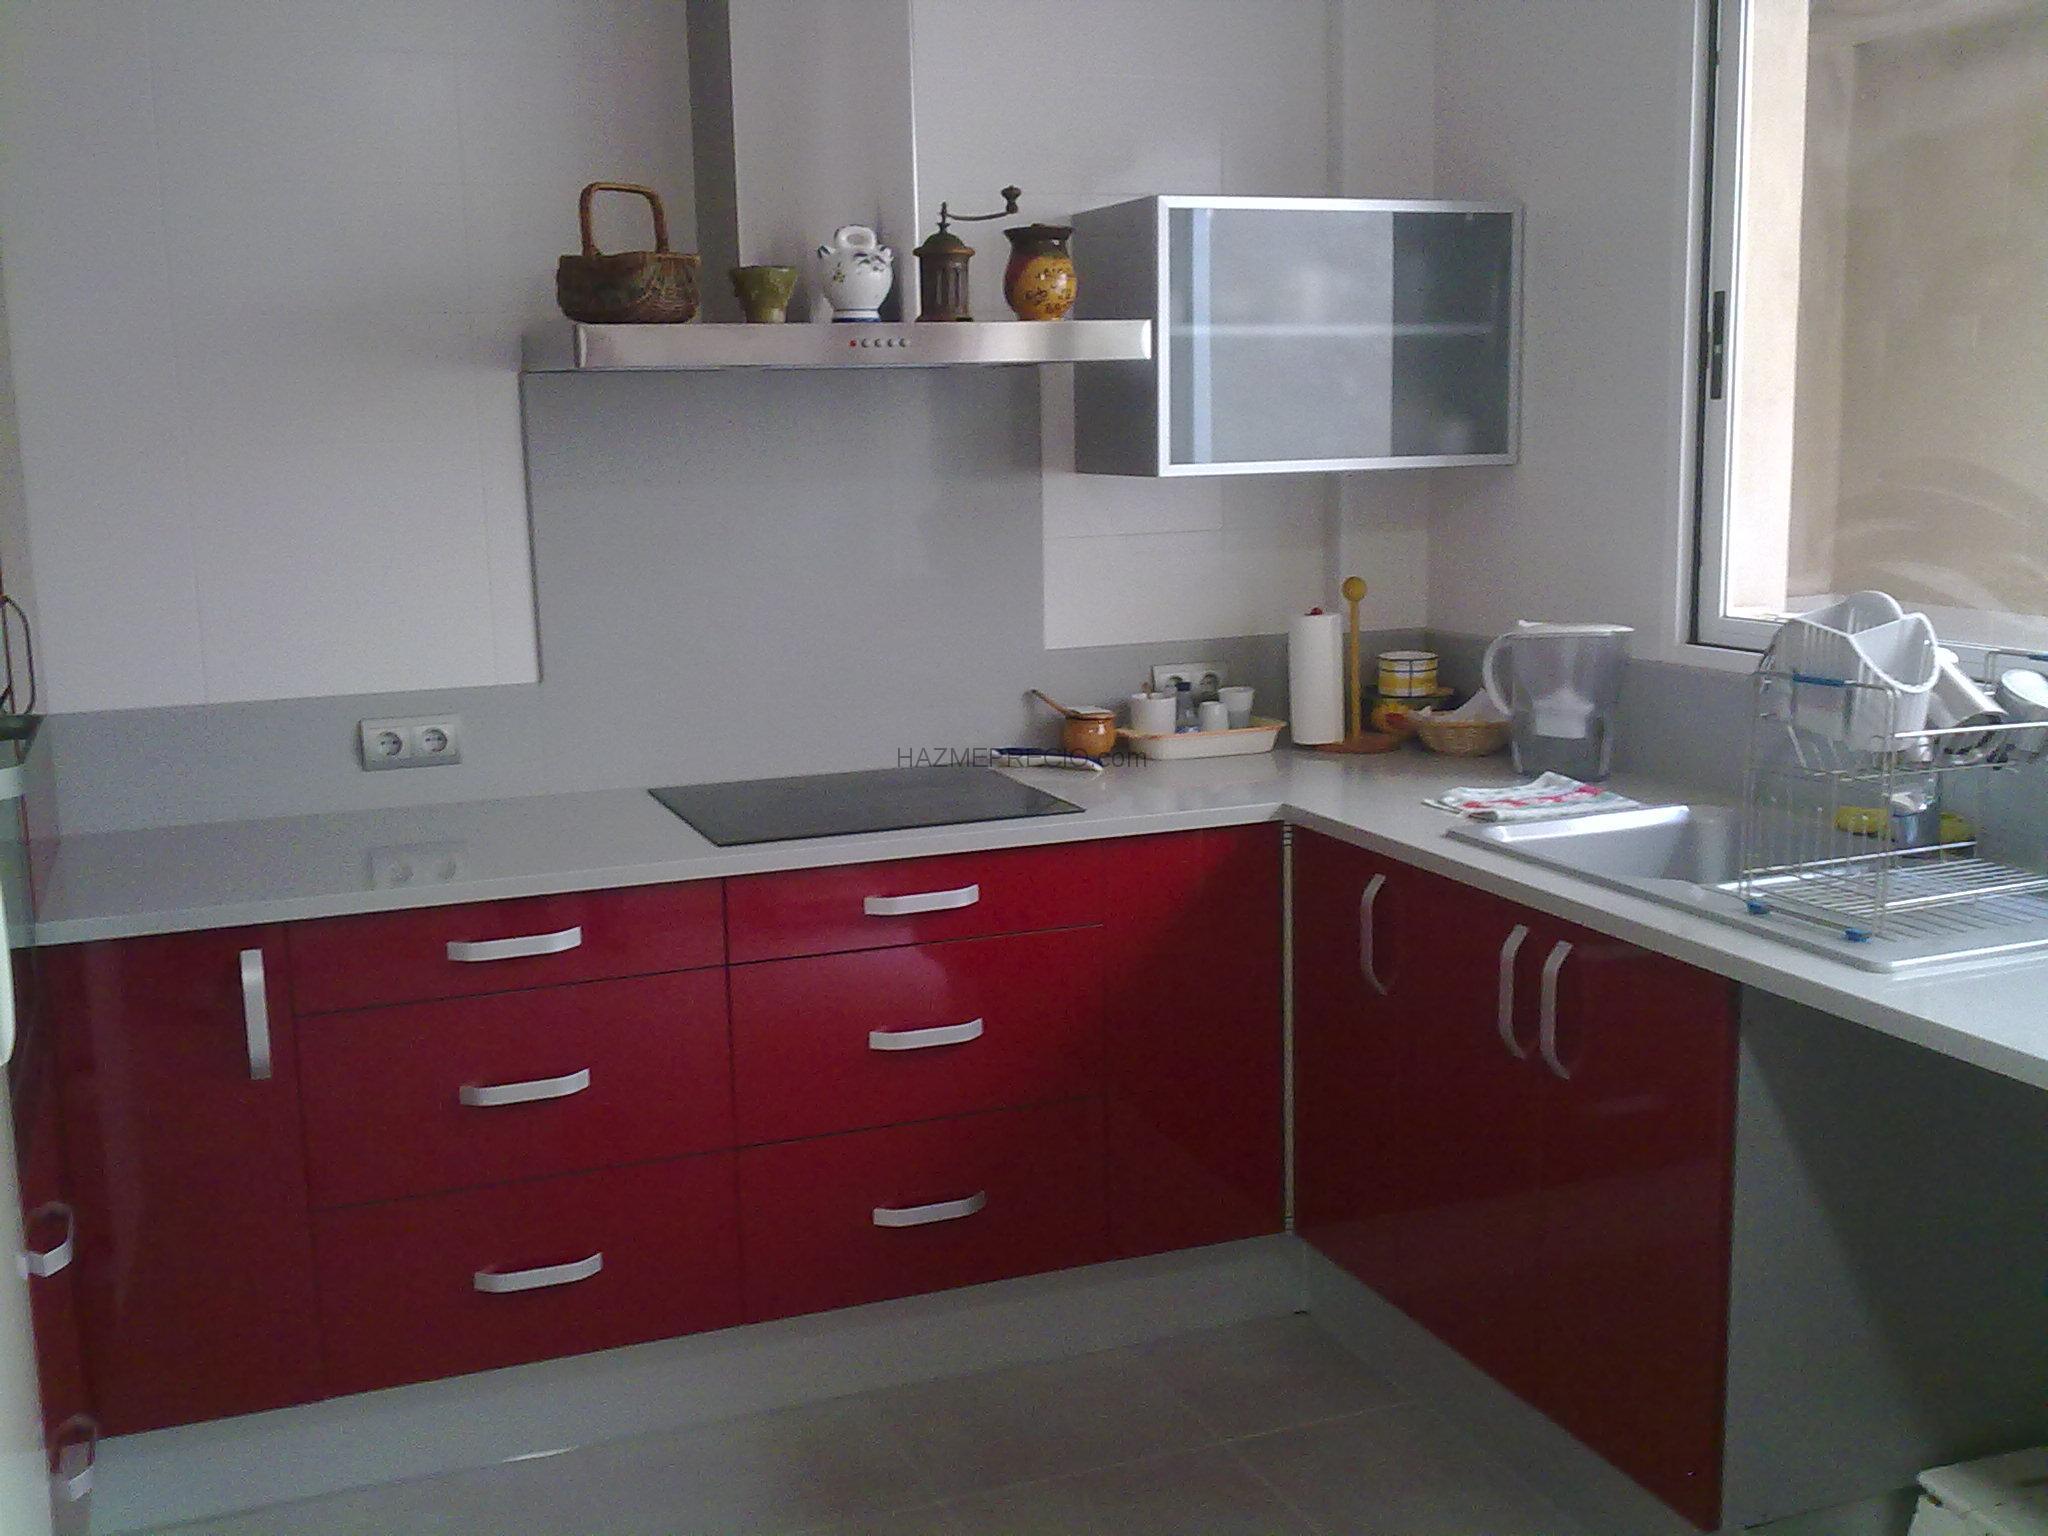 Empresas de cocinas en valencia for Cocinas en valencia